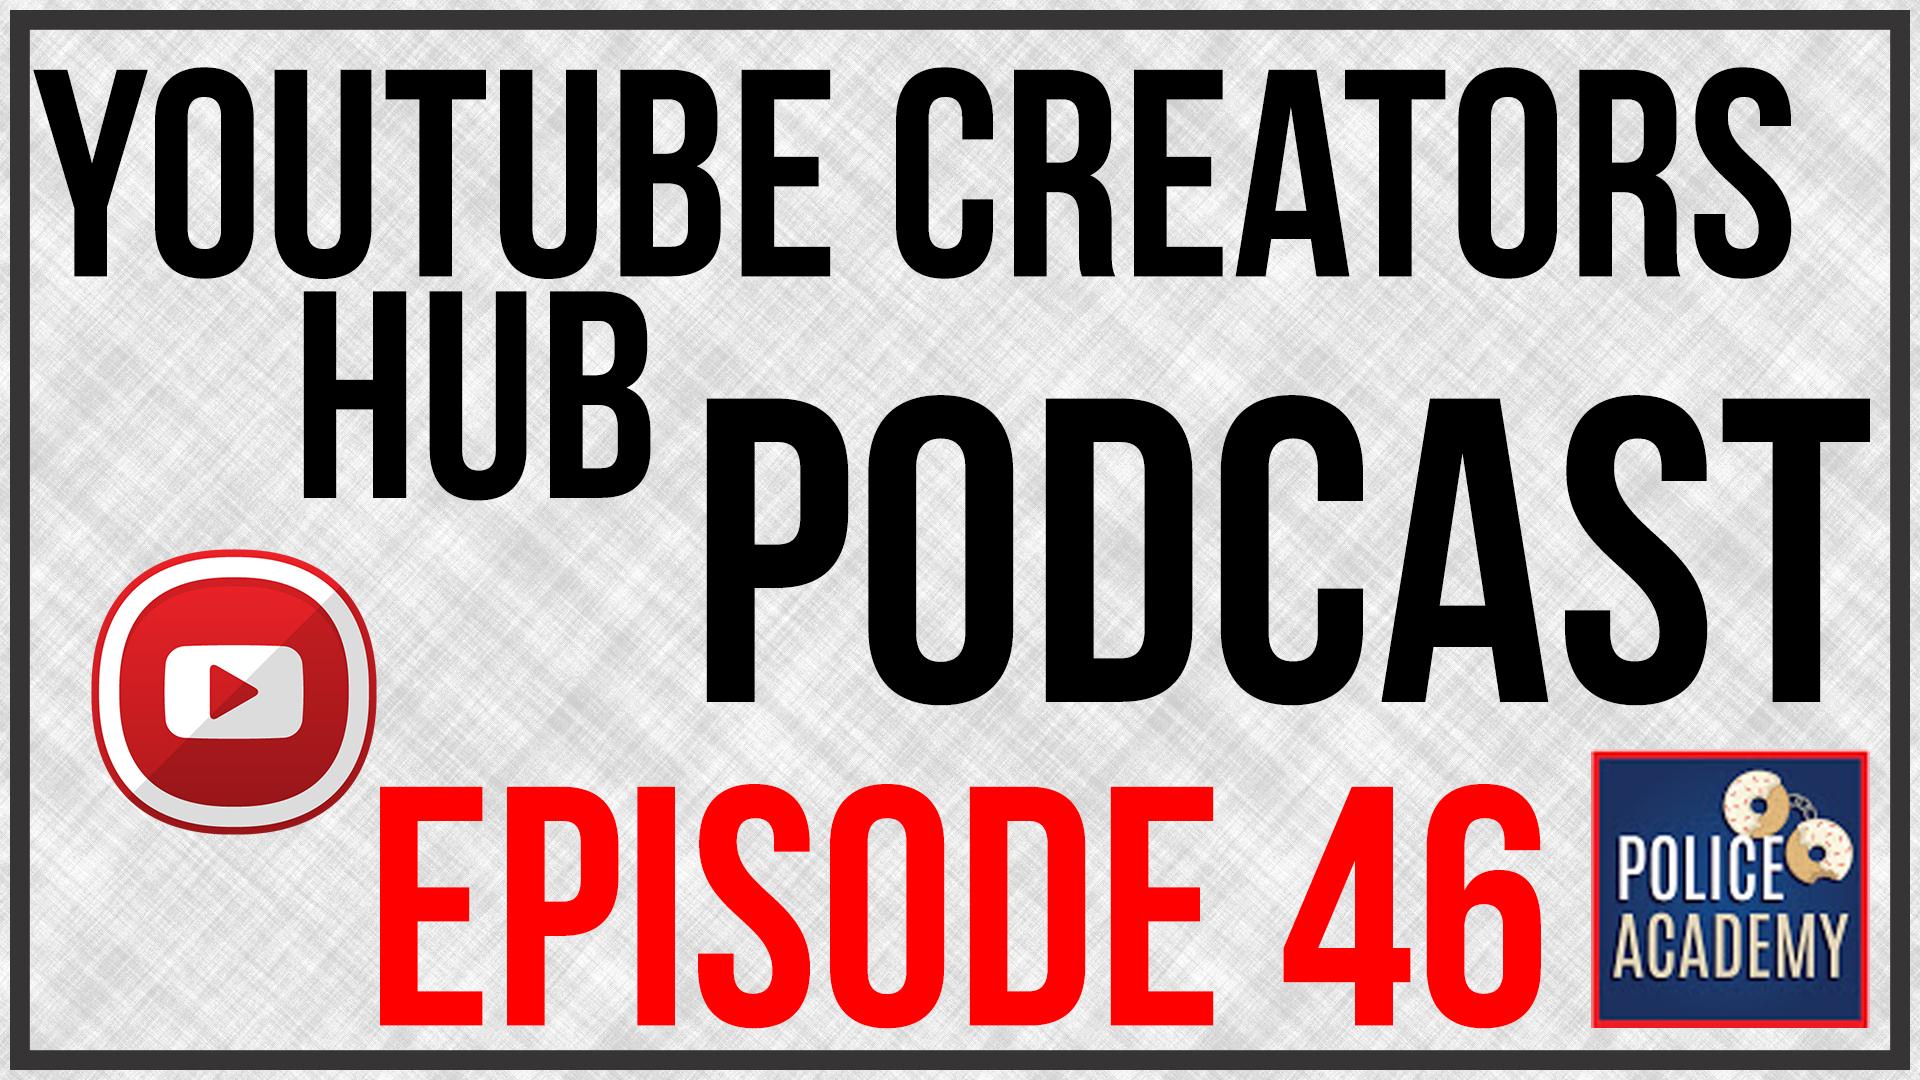 YouTube Creators Hub Podcast Episode 047